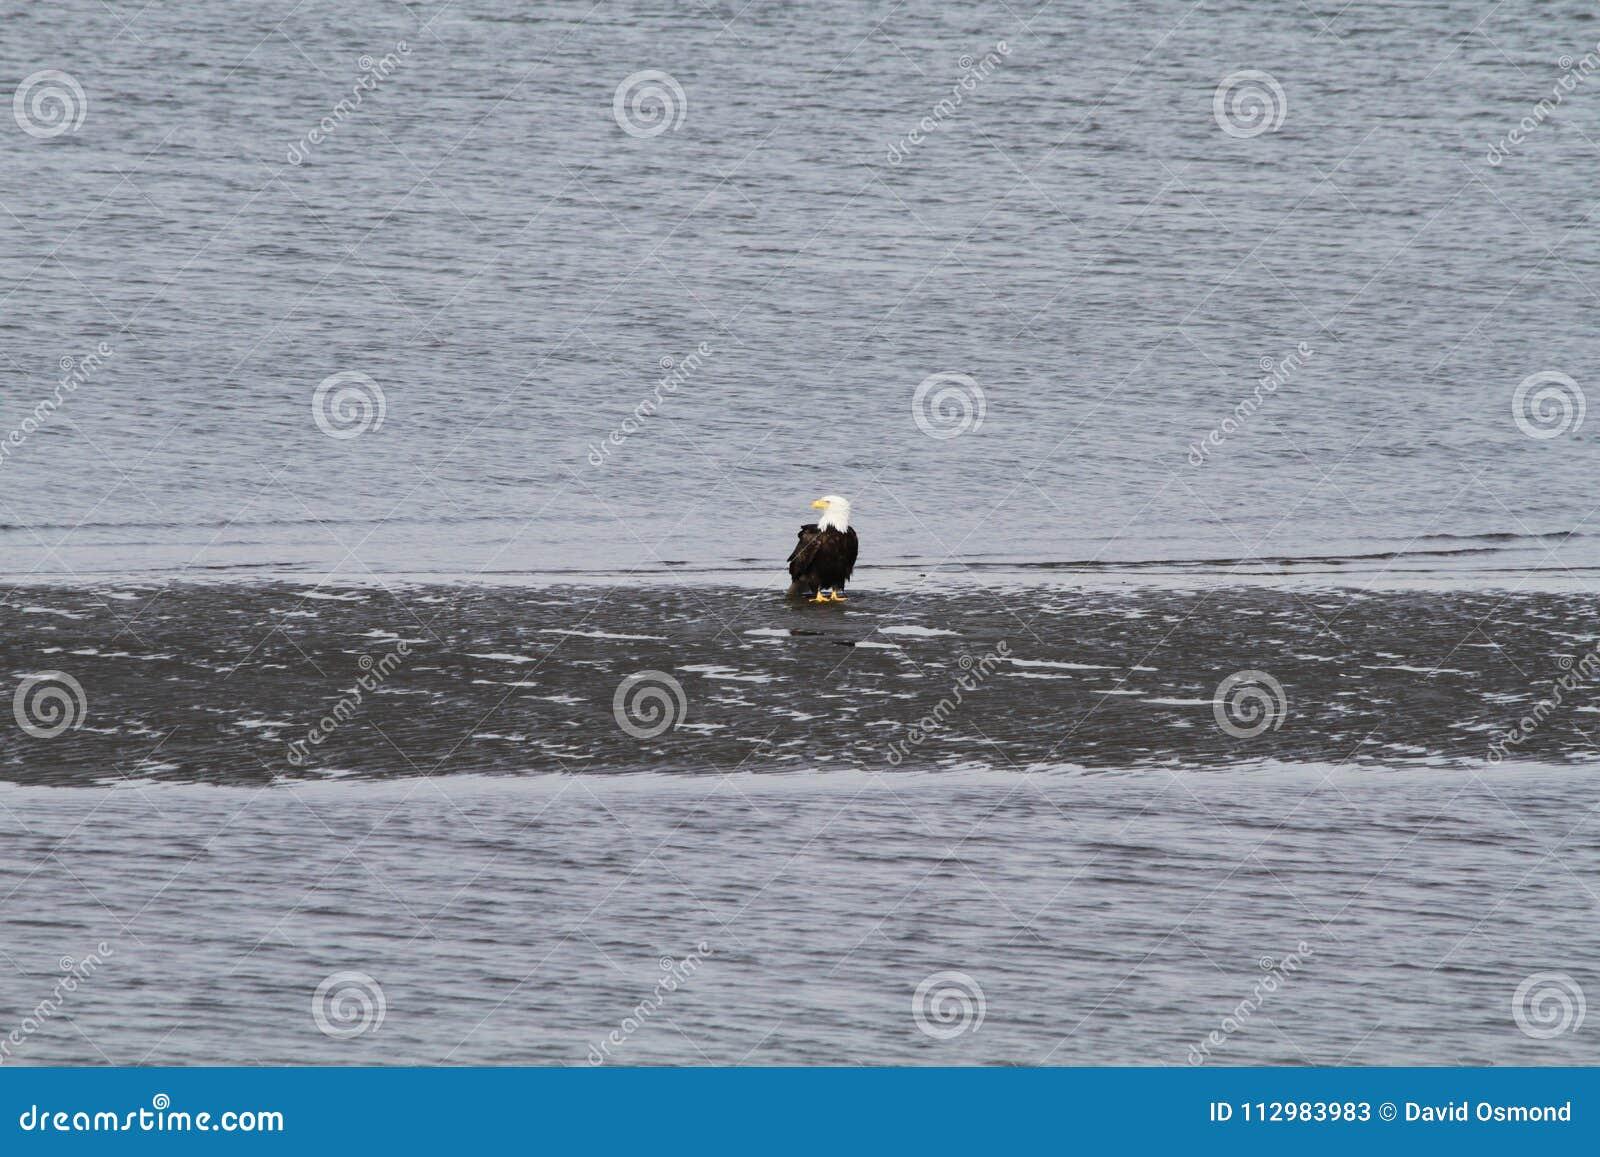 A bald eagle standing on a beach